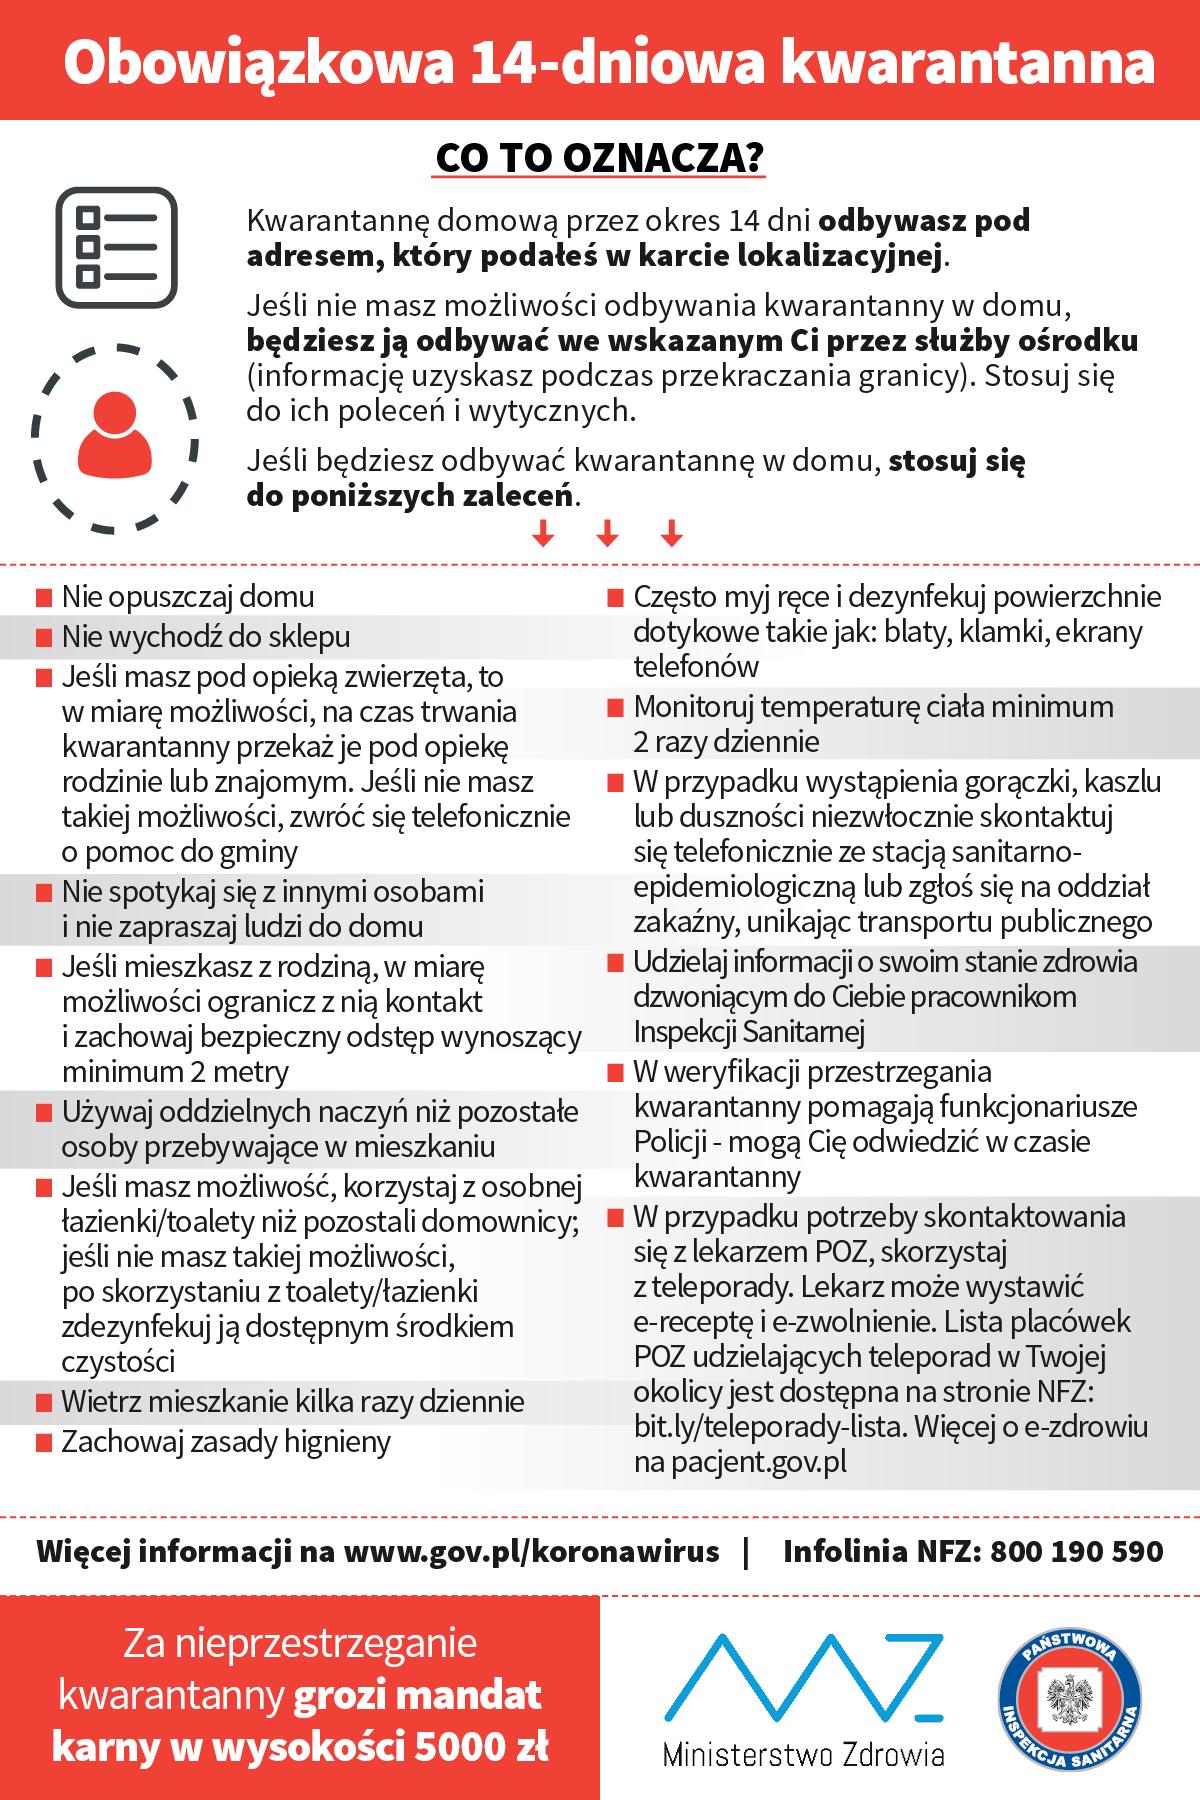 https://wsse.krakow.pl/page/wp-content/uploads/2020/03/kwarantanna-1.png